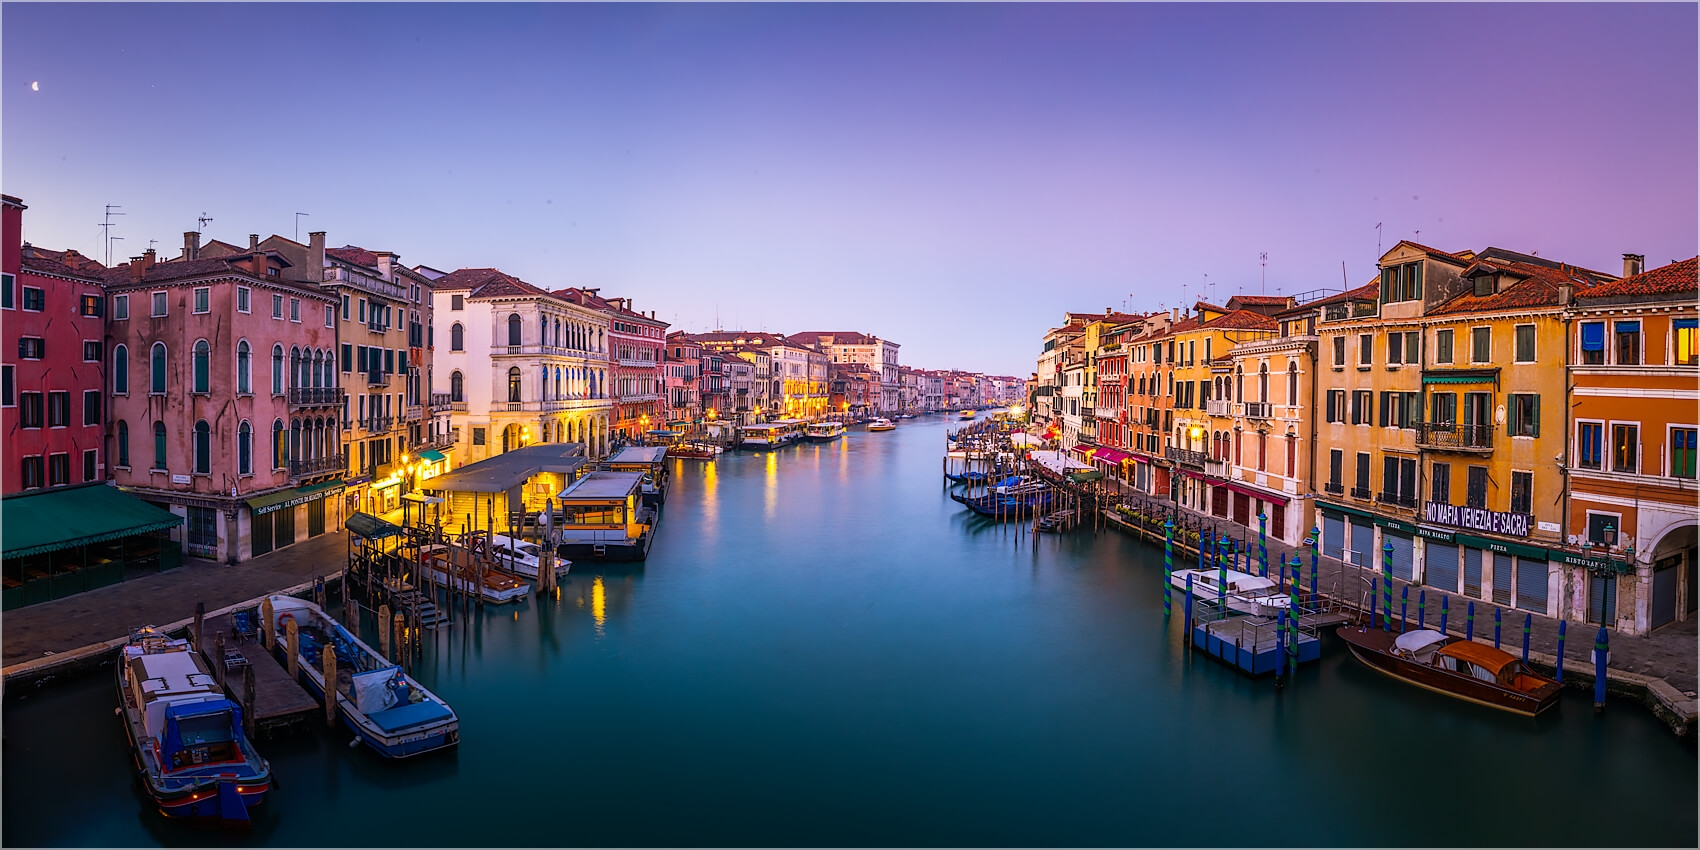 Panoramabild morgens am Canal Grande Venedig